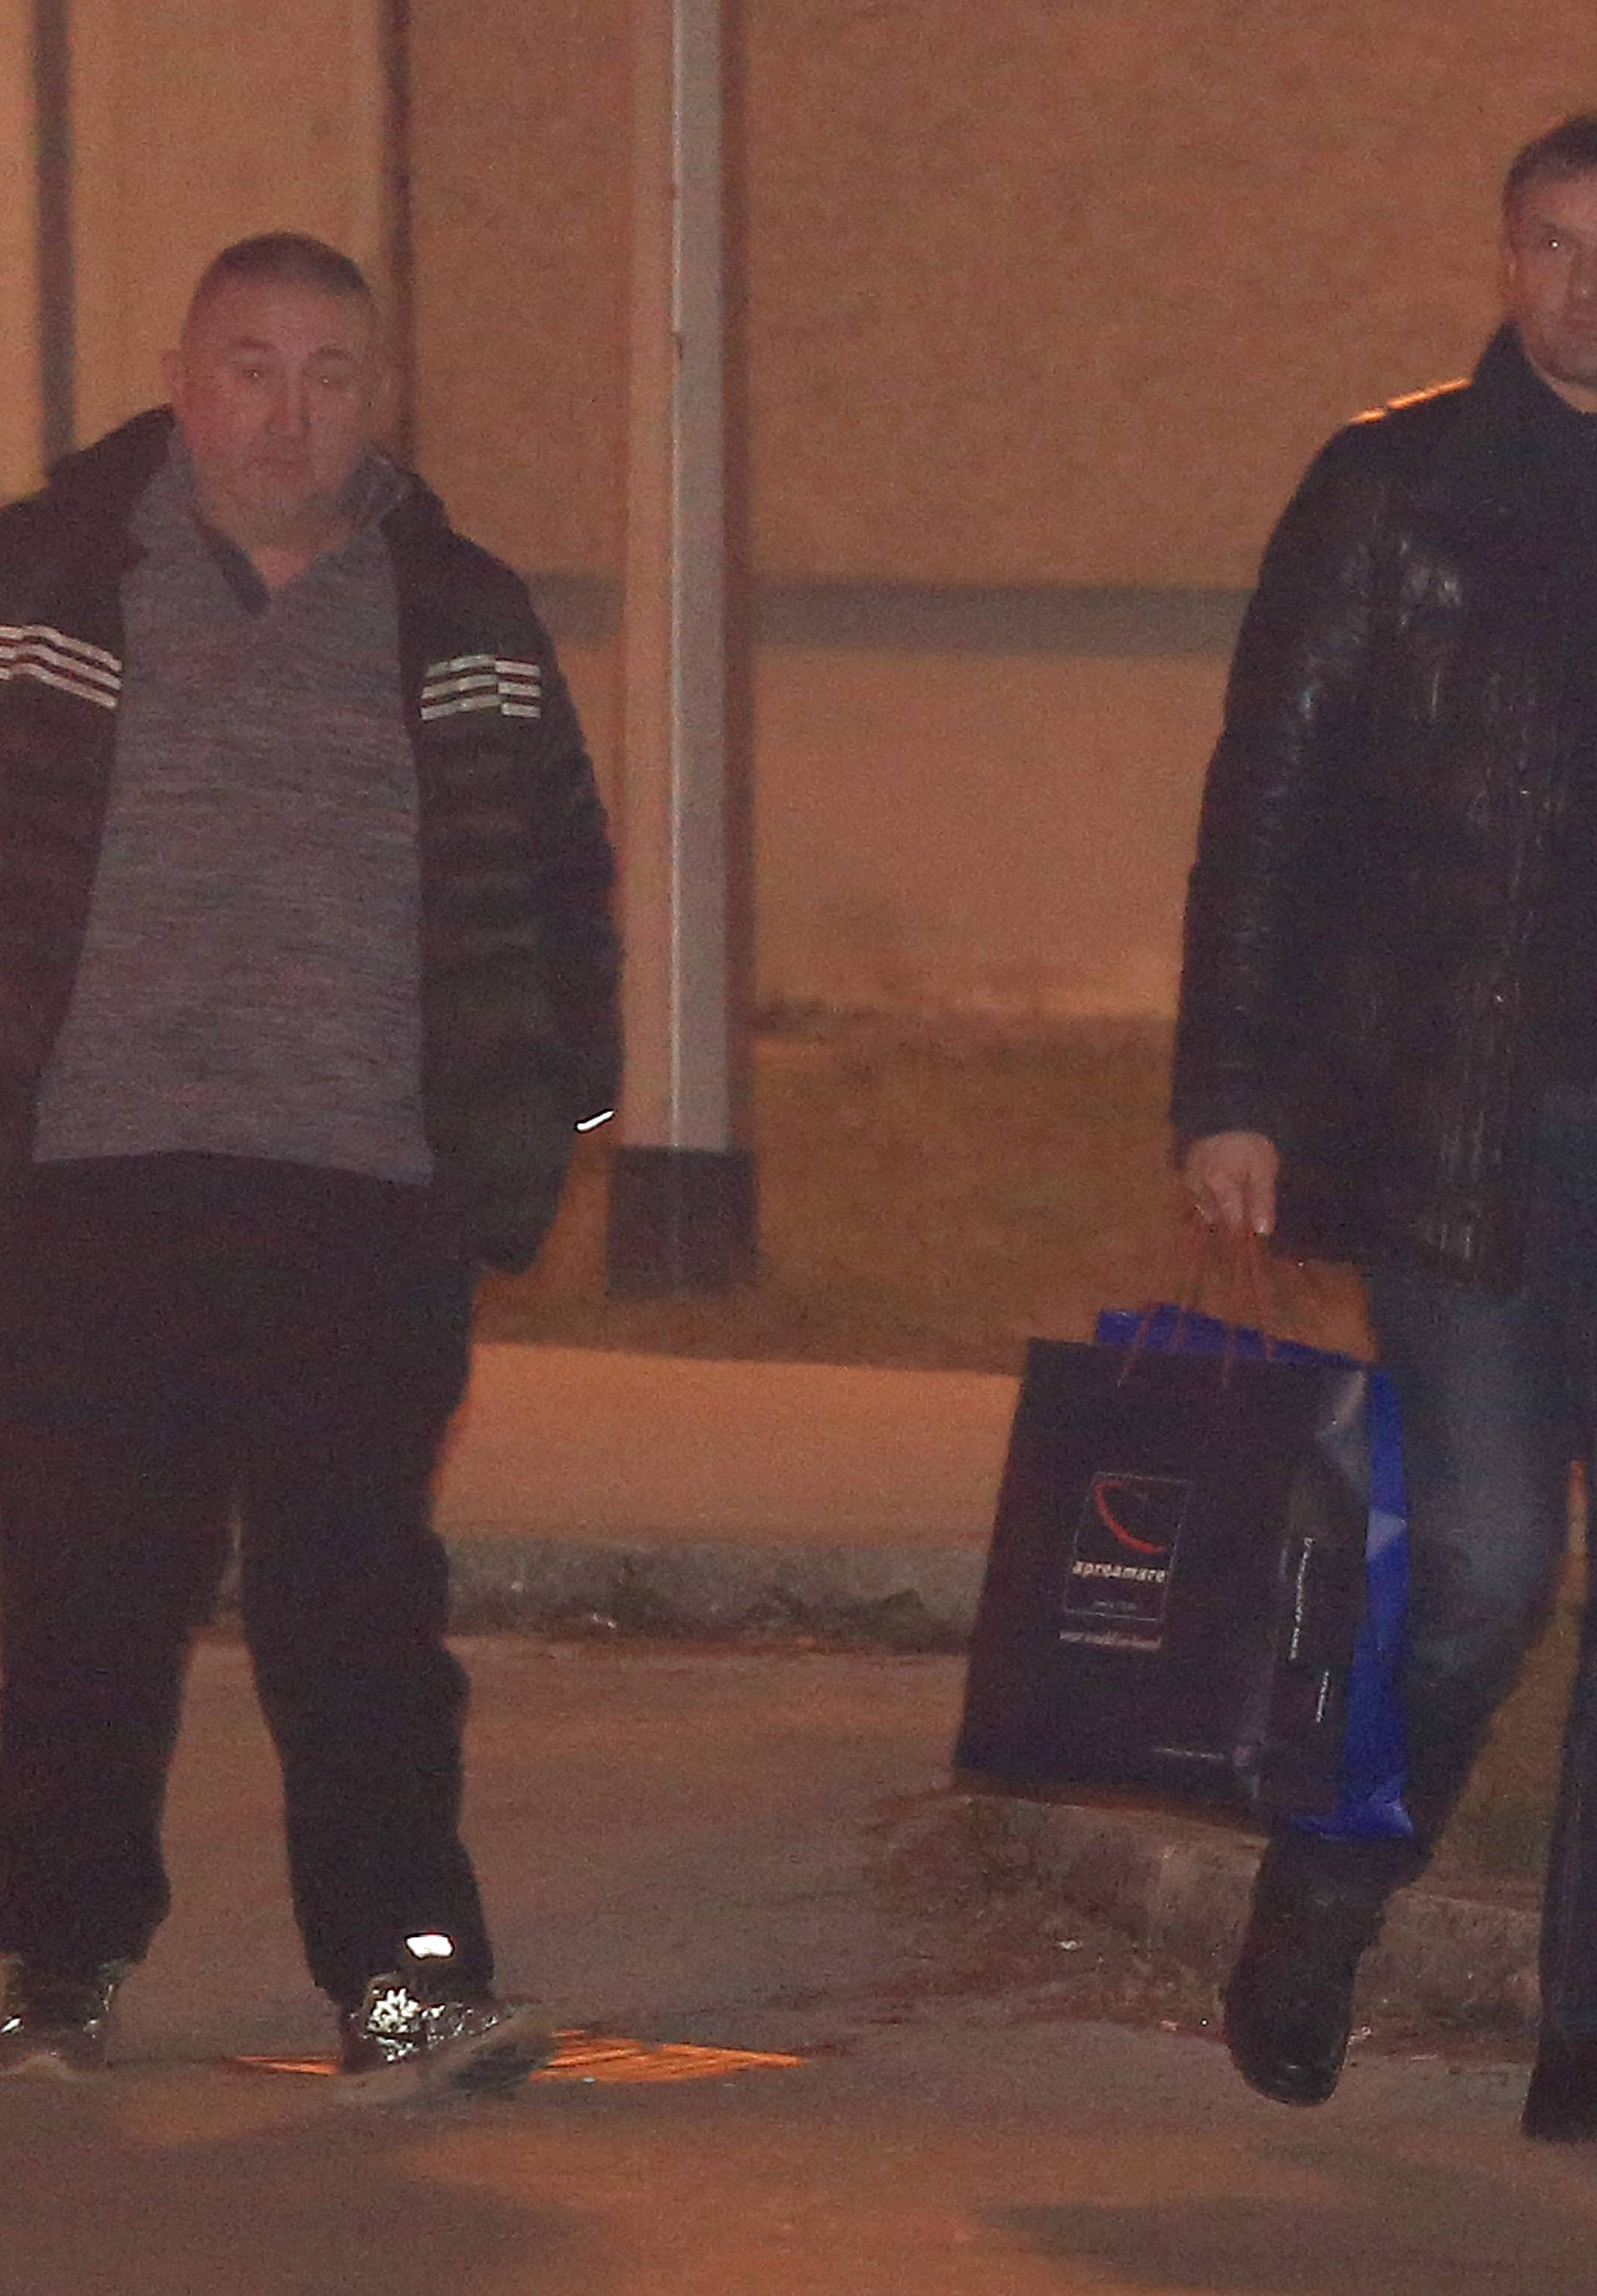 Dolački se navodno skrivao na obiteljskom imanju u Lekeniku